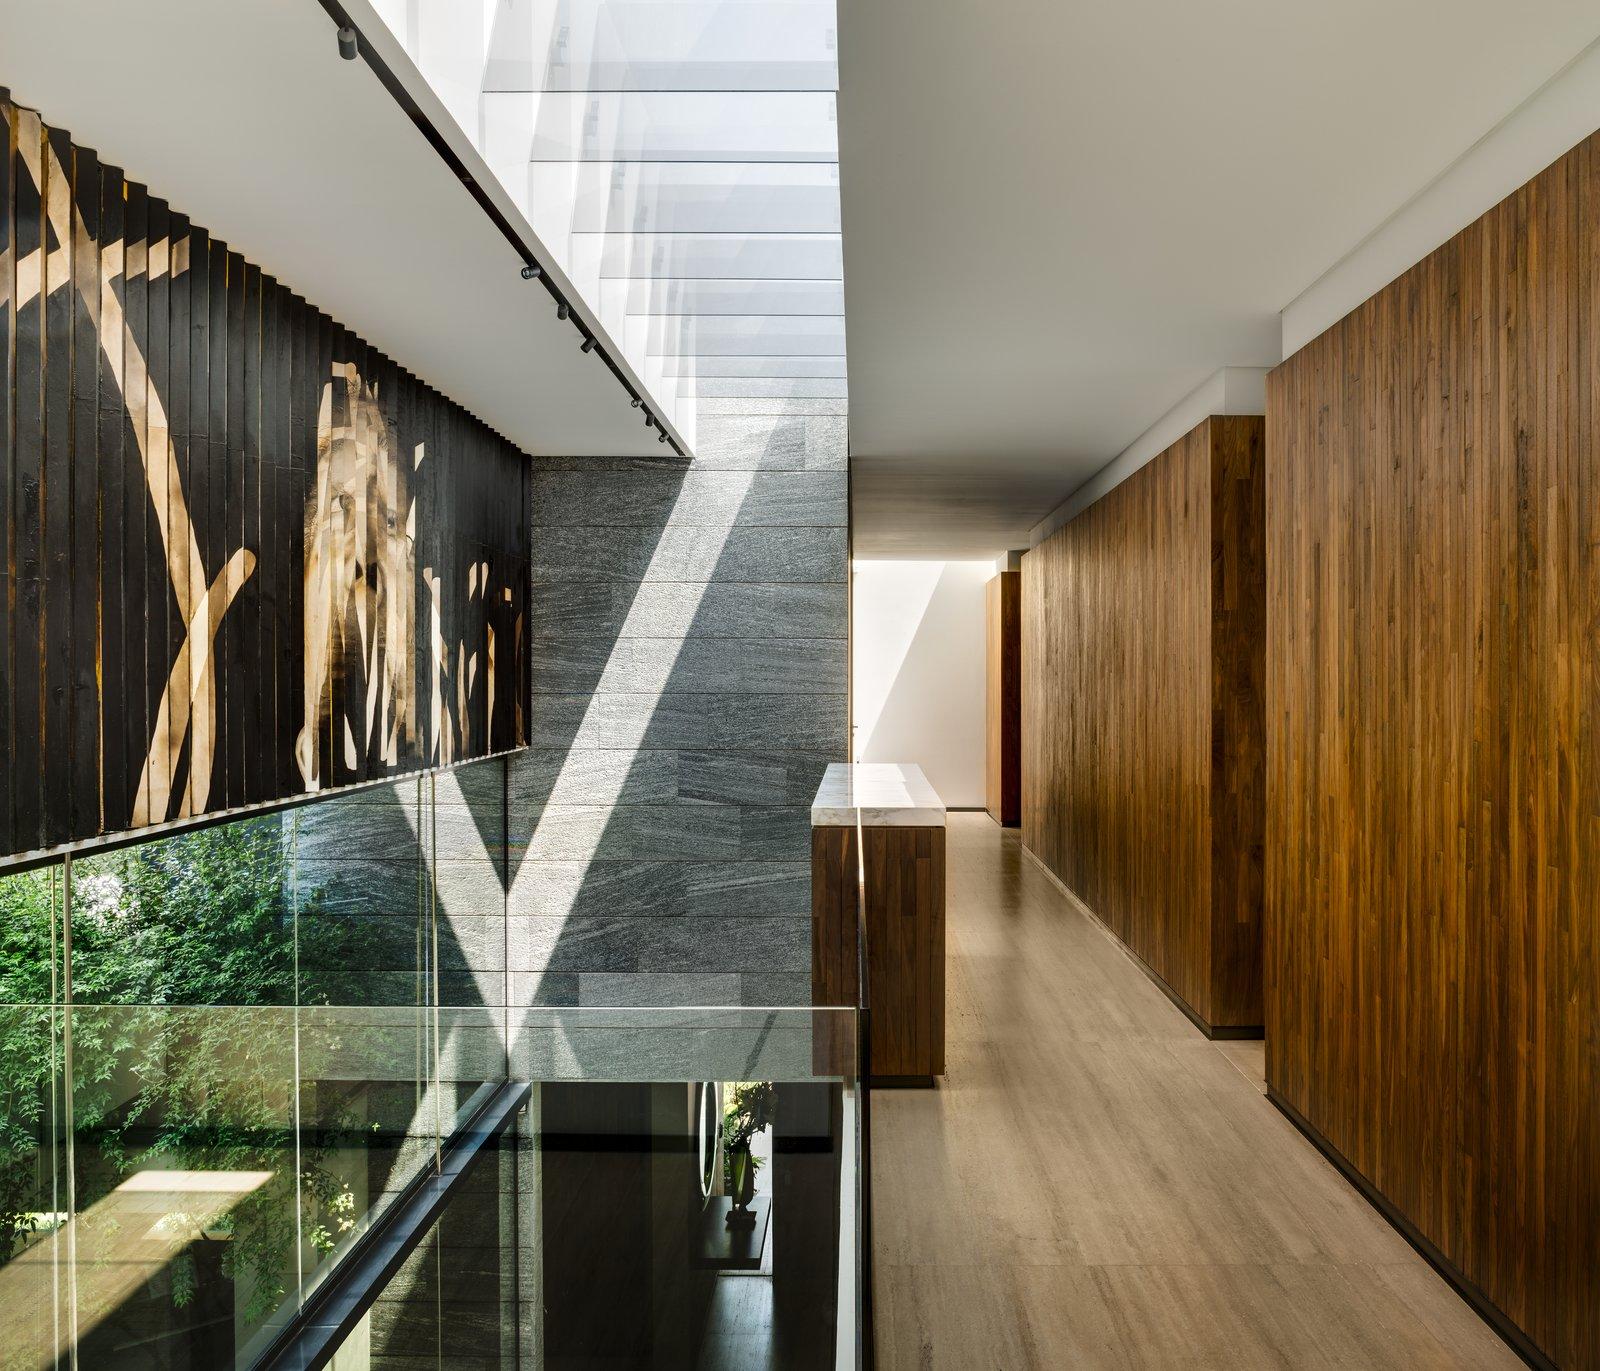 Tagged: Hallway and Light Hardwood Floor.  Casa O Cuatro by Migdal Arquitectos